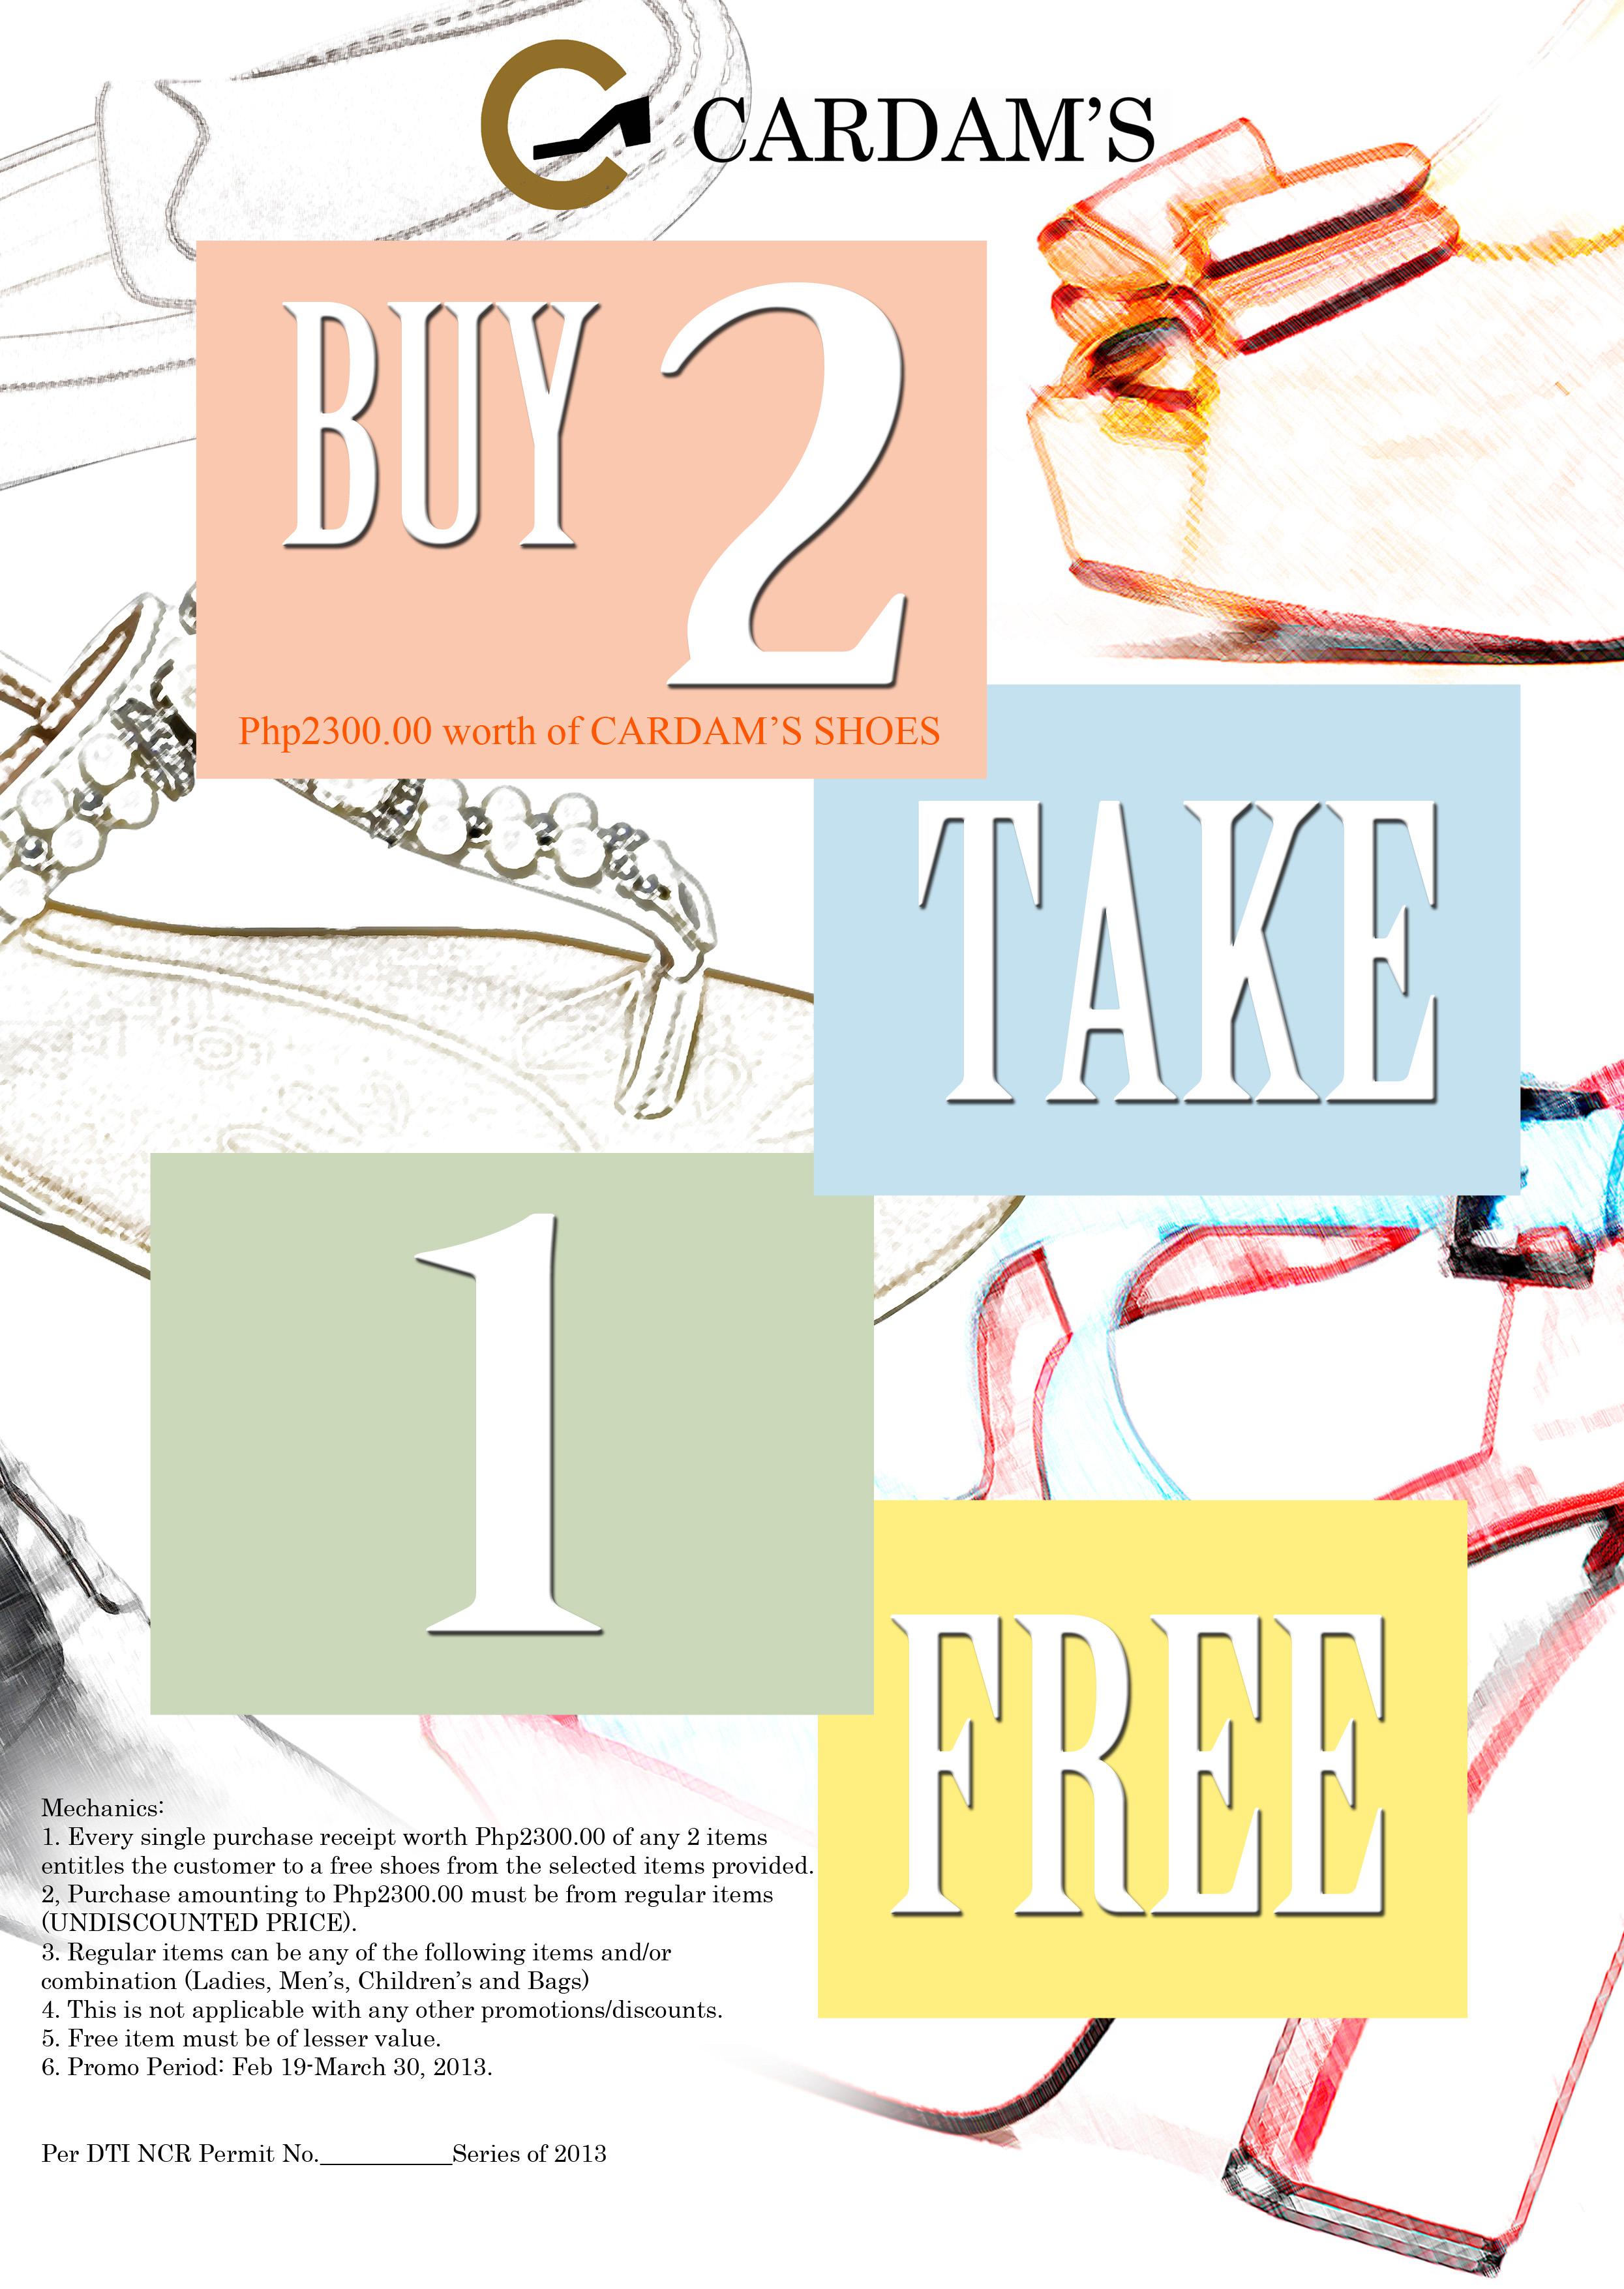 Cardams Buy 2 Take 1 Promo March 2013